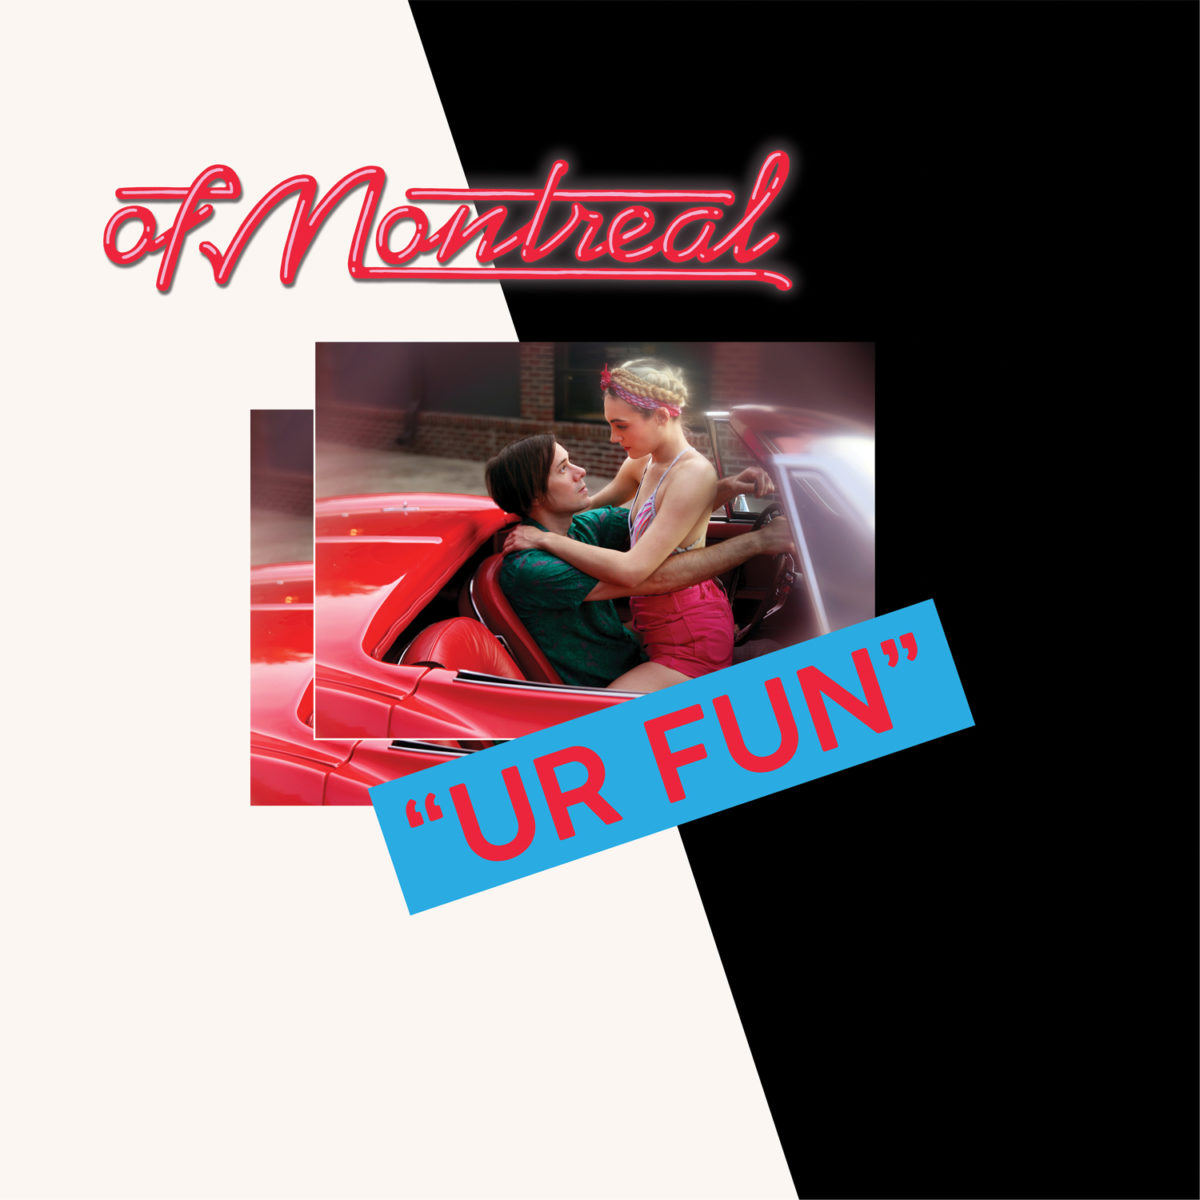 of Montreal's UR FUN album released today (1/17)